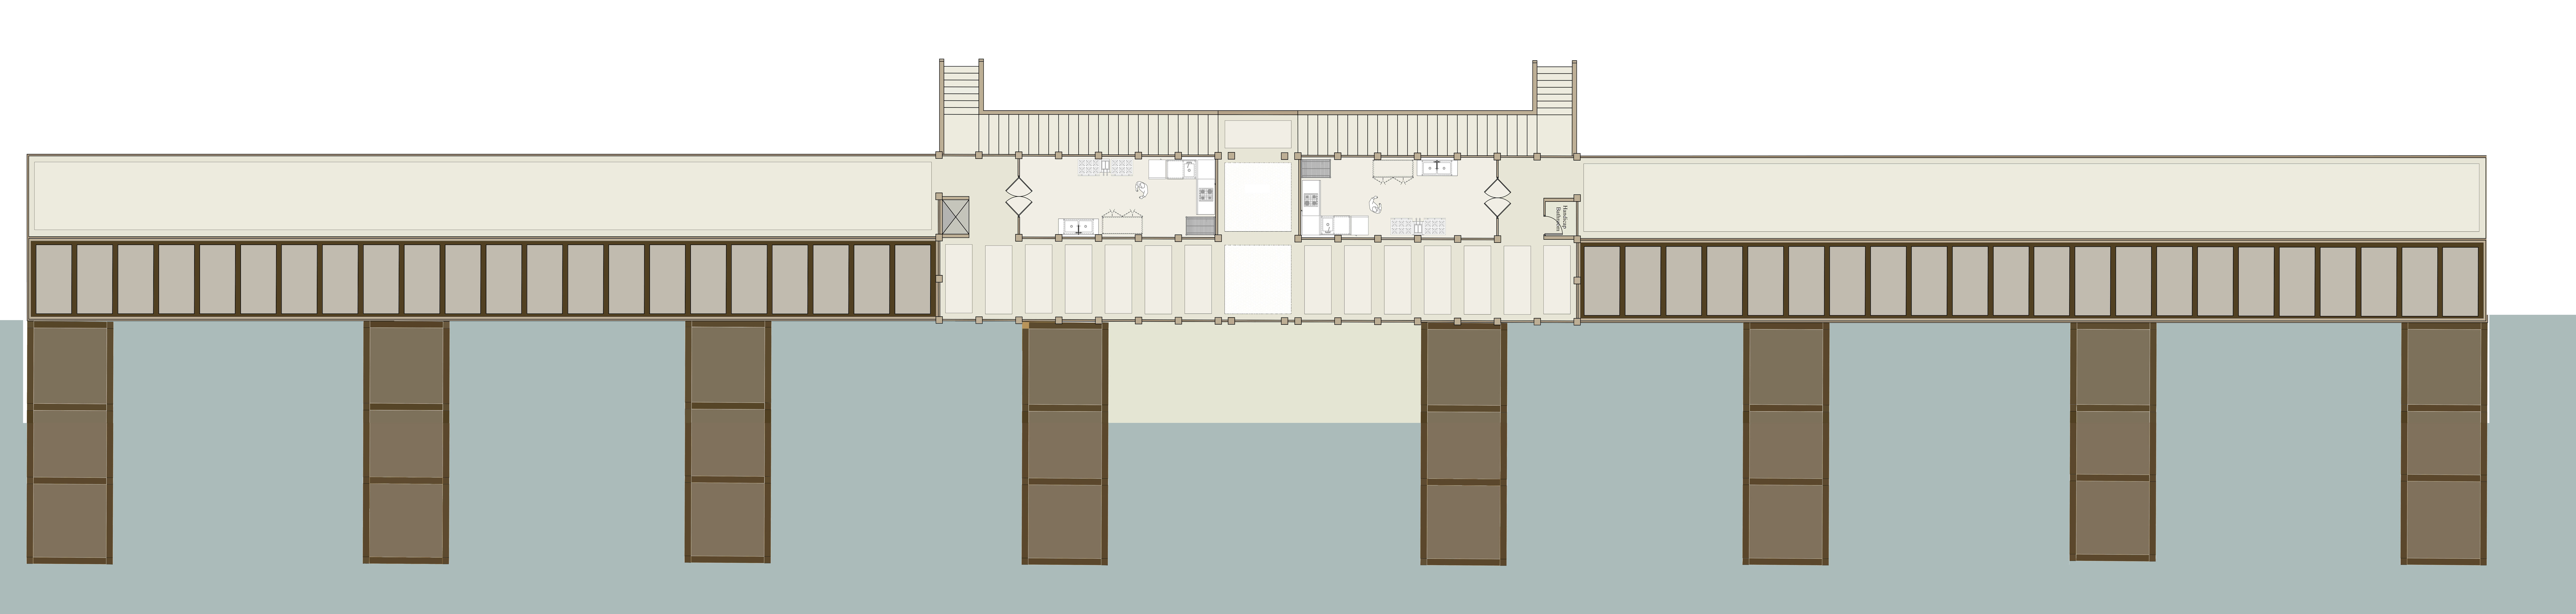 Second Floor Plan Photoshopfinal